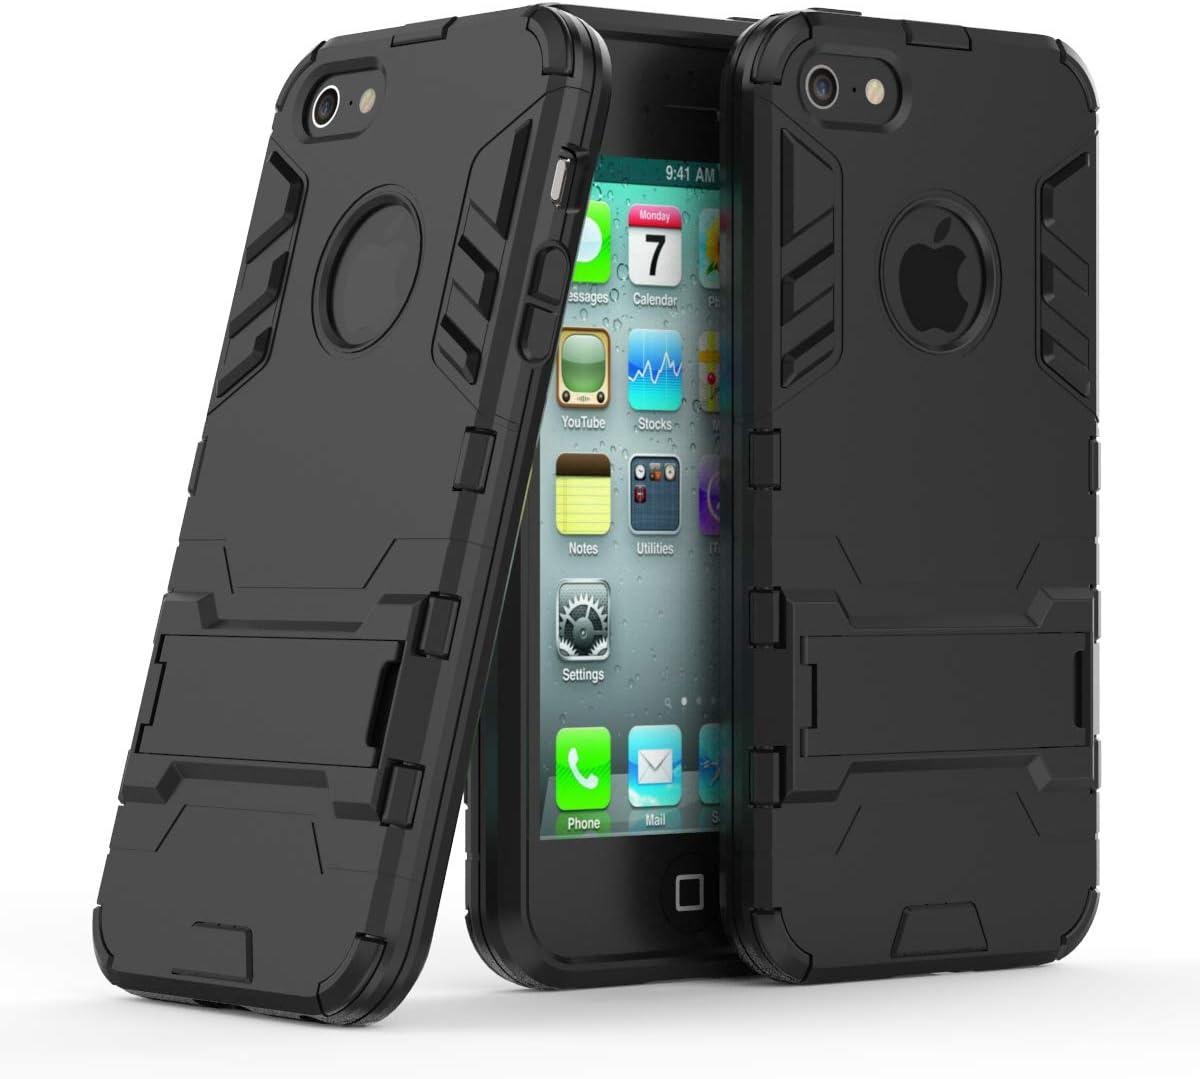 Cocomii Iron Man Armor iPhone SE/5S/5C/5 Case, Slim Thin Matte Vertical & Horizontal Kickstand Reinforced Drop Protection Fashion Phone Case Bumper Cover for Apple iPhone SE/5S/5C/5 (Jet Black)